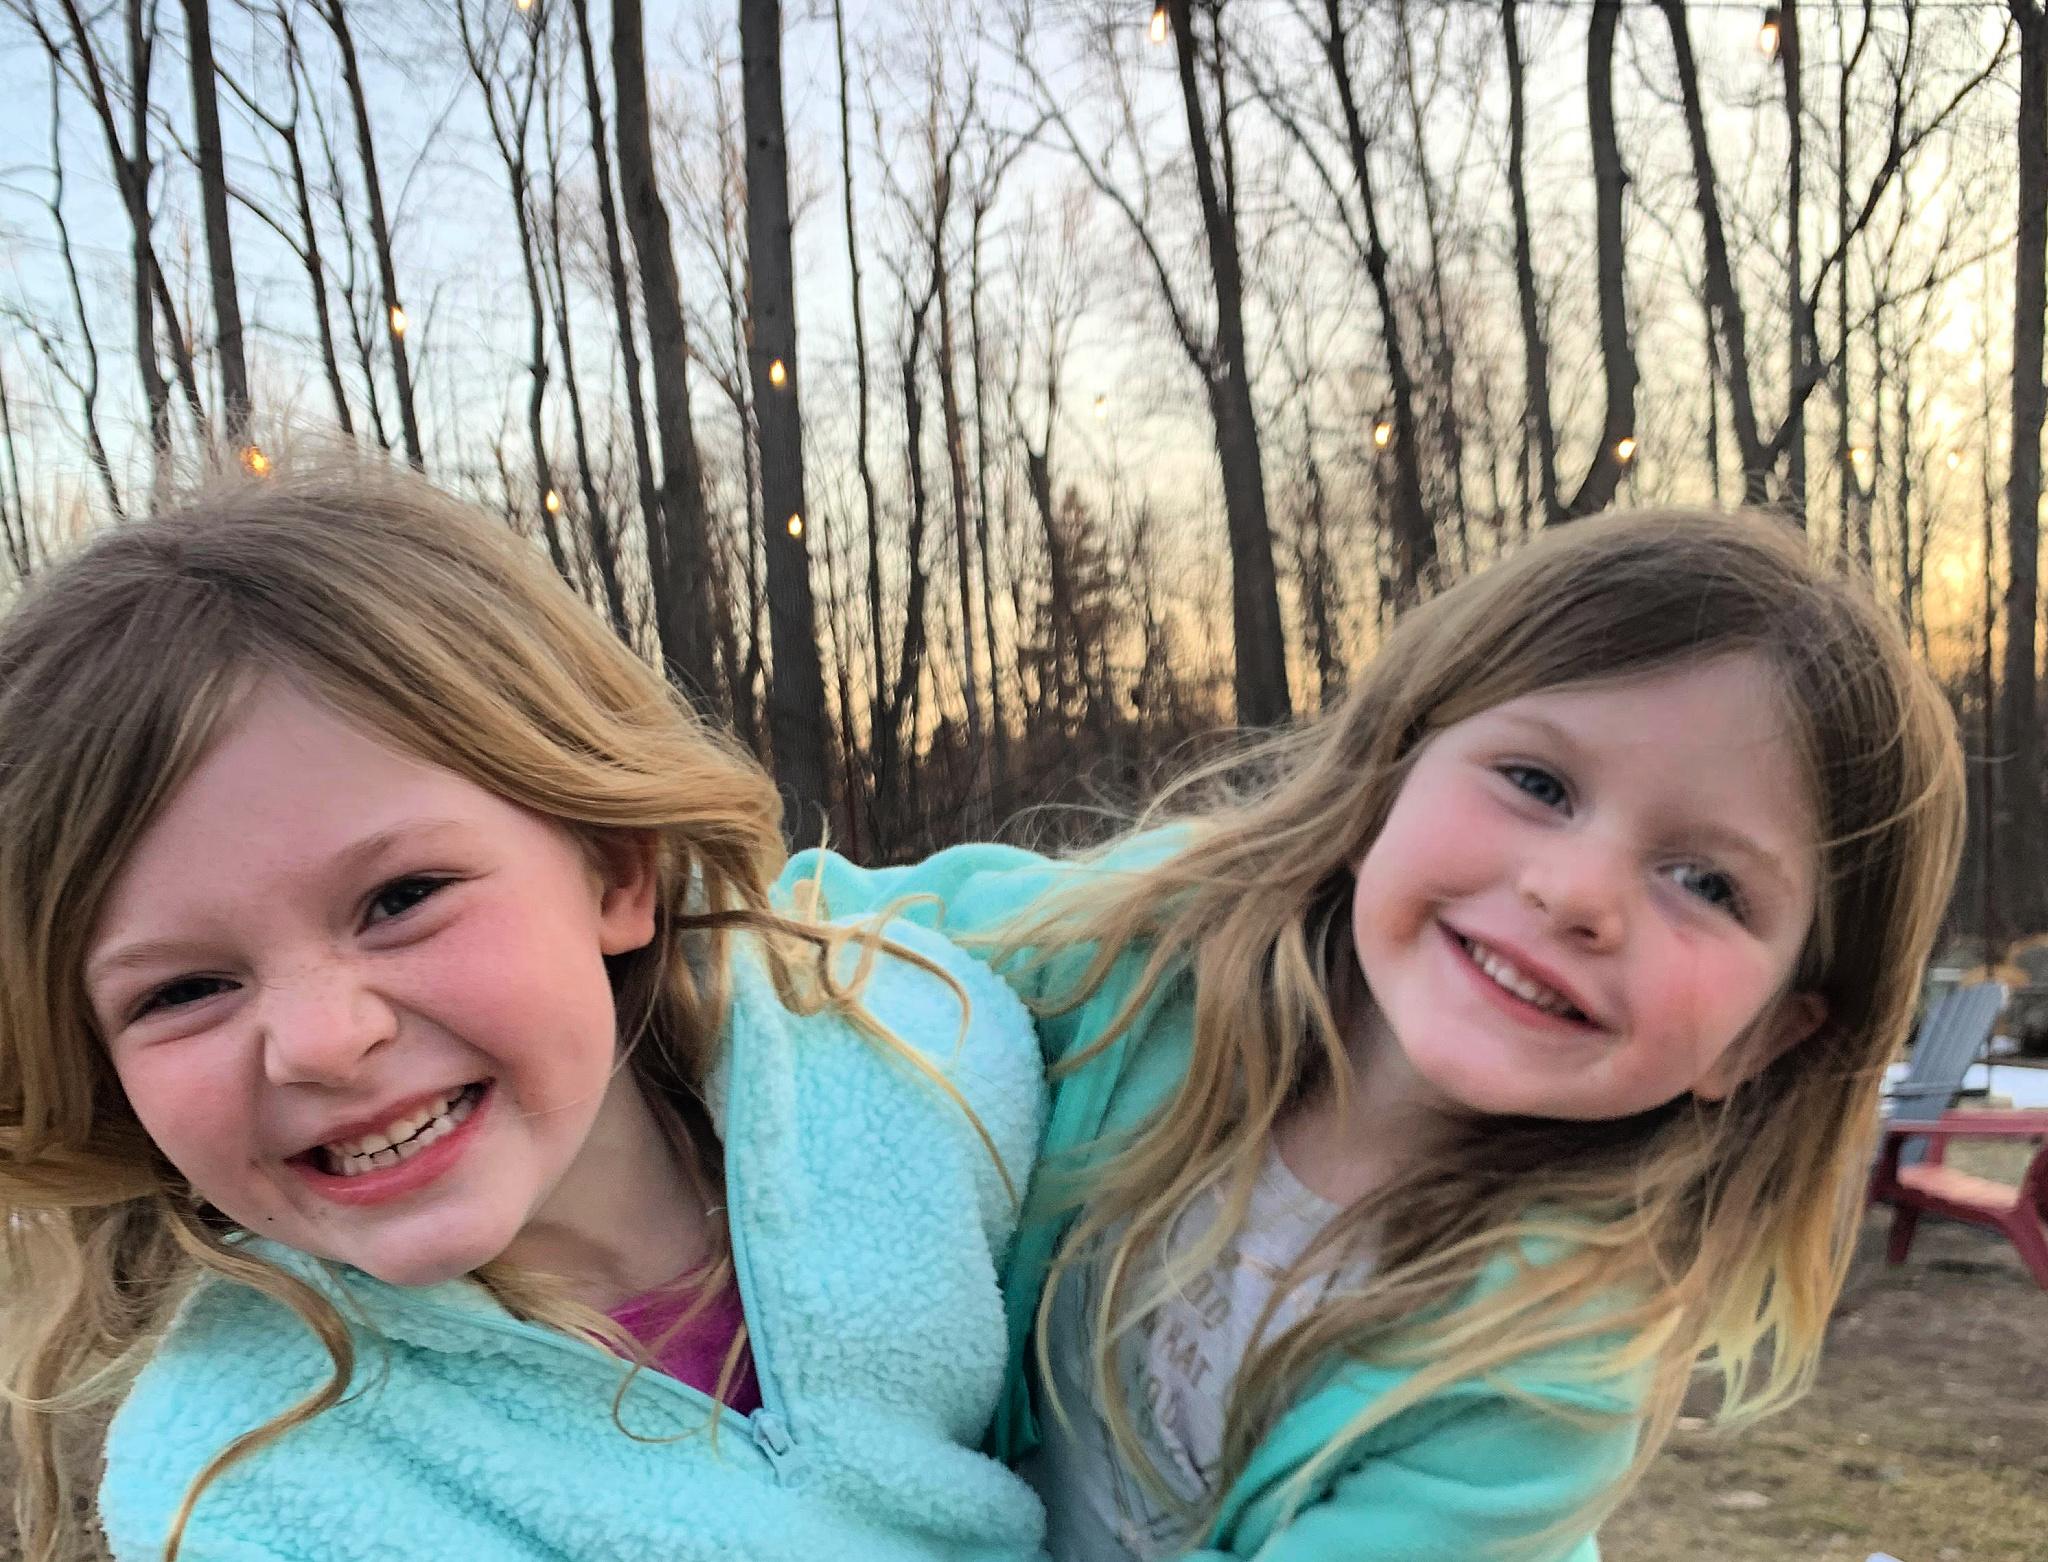 Family Friday (vol. 122): Springtime is in the Air! via @preventionrd